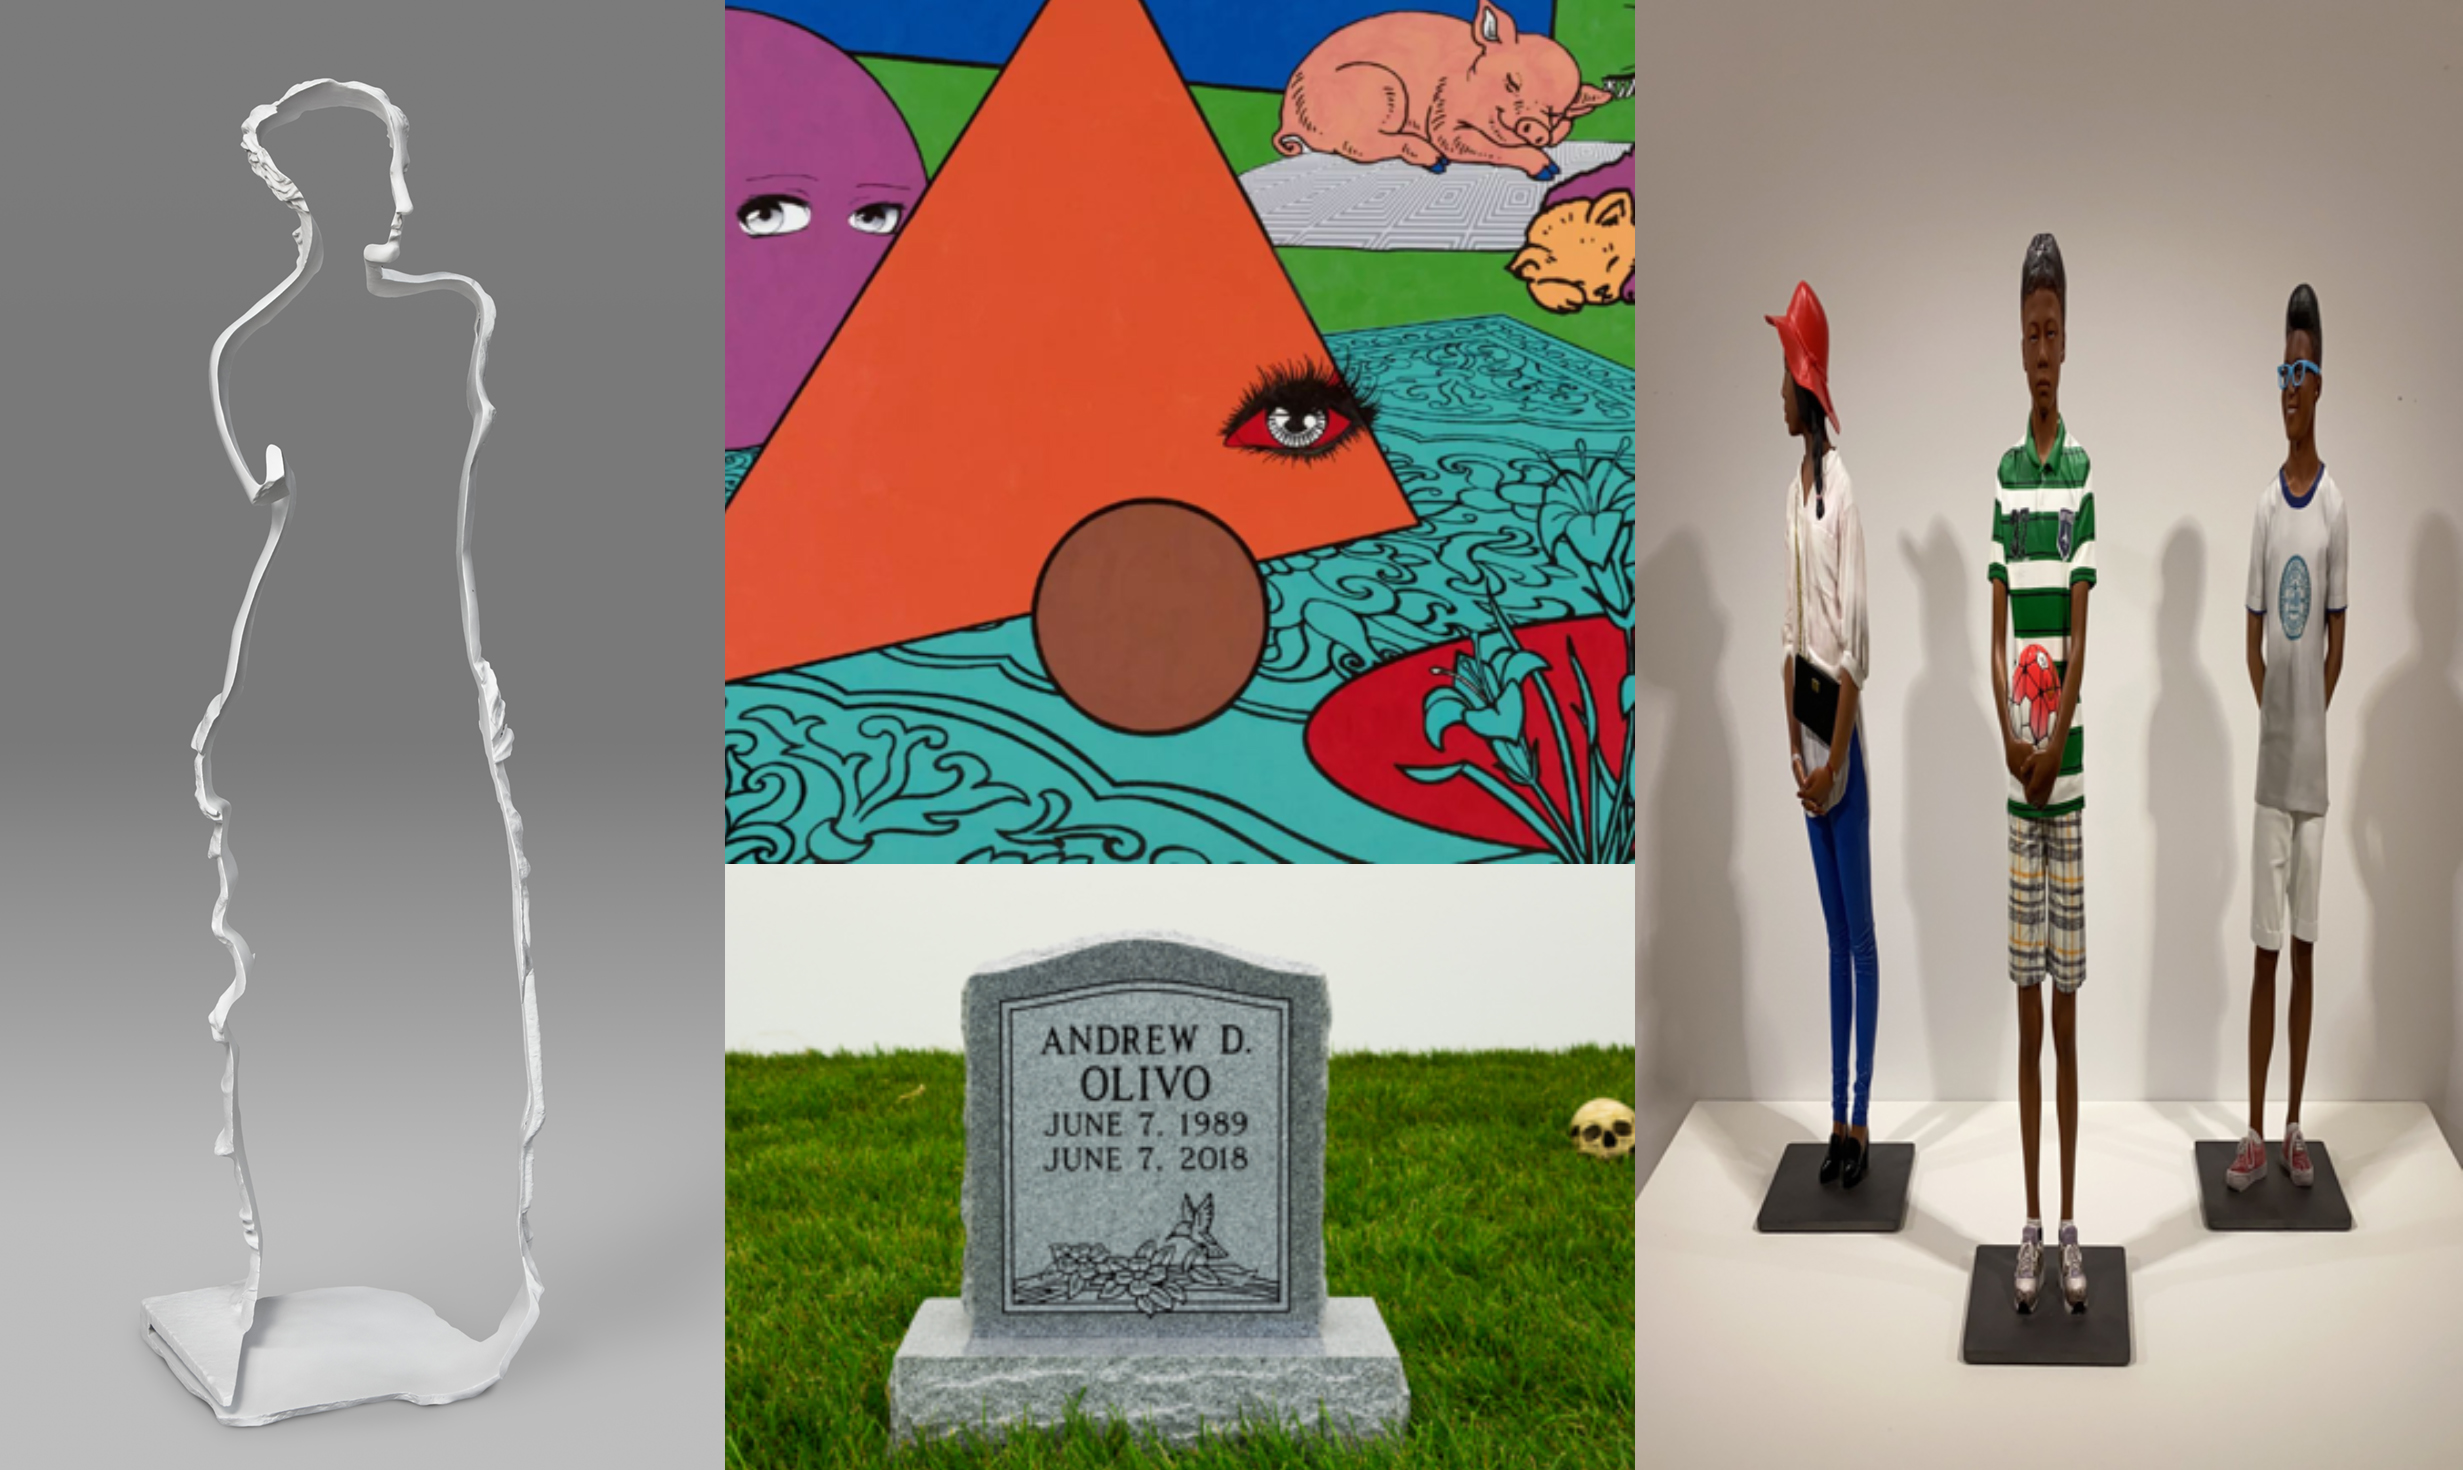 ART021 现场直击:一份最值得留意的作品清单